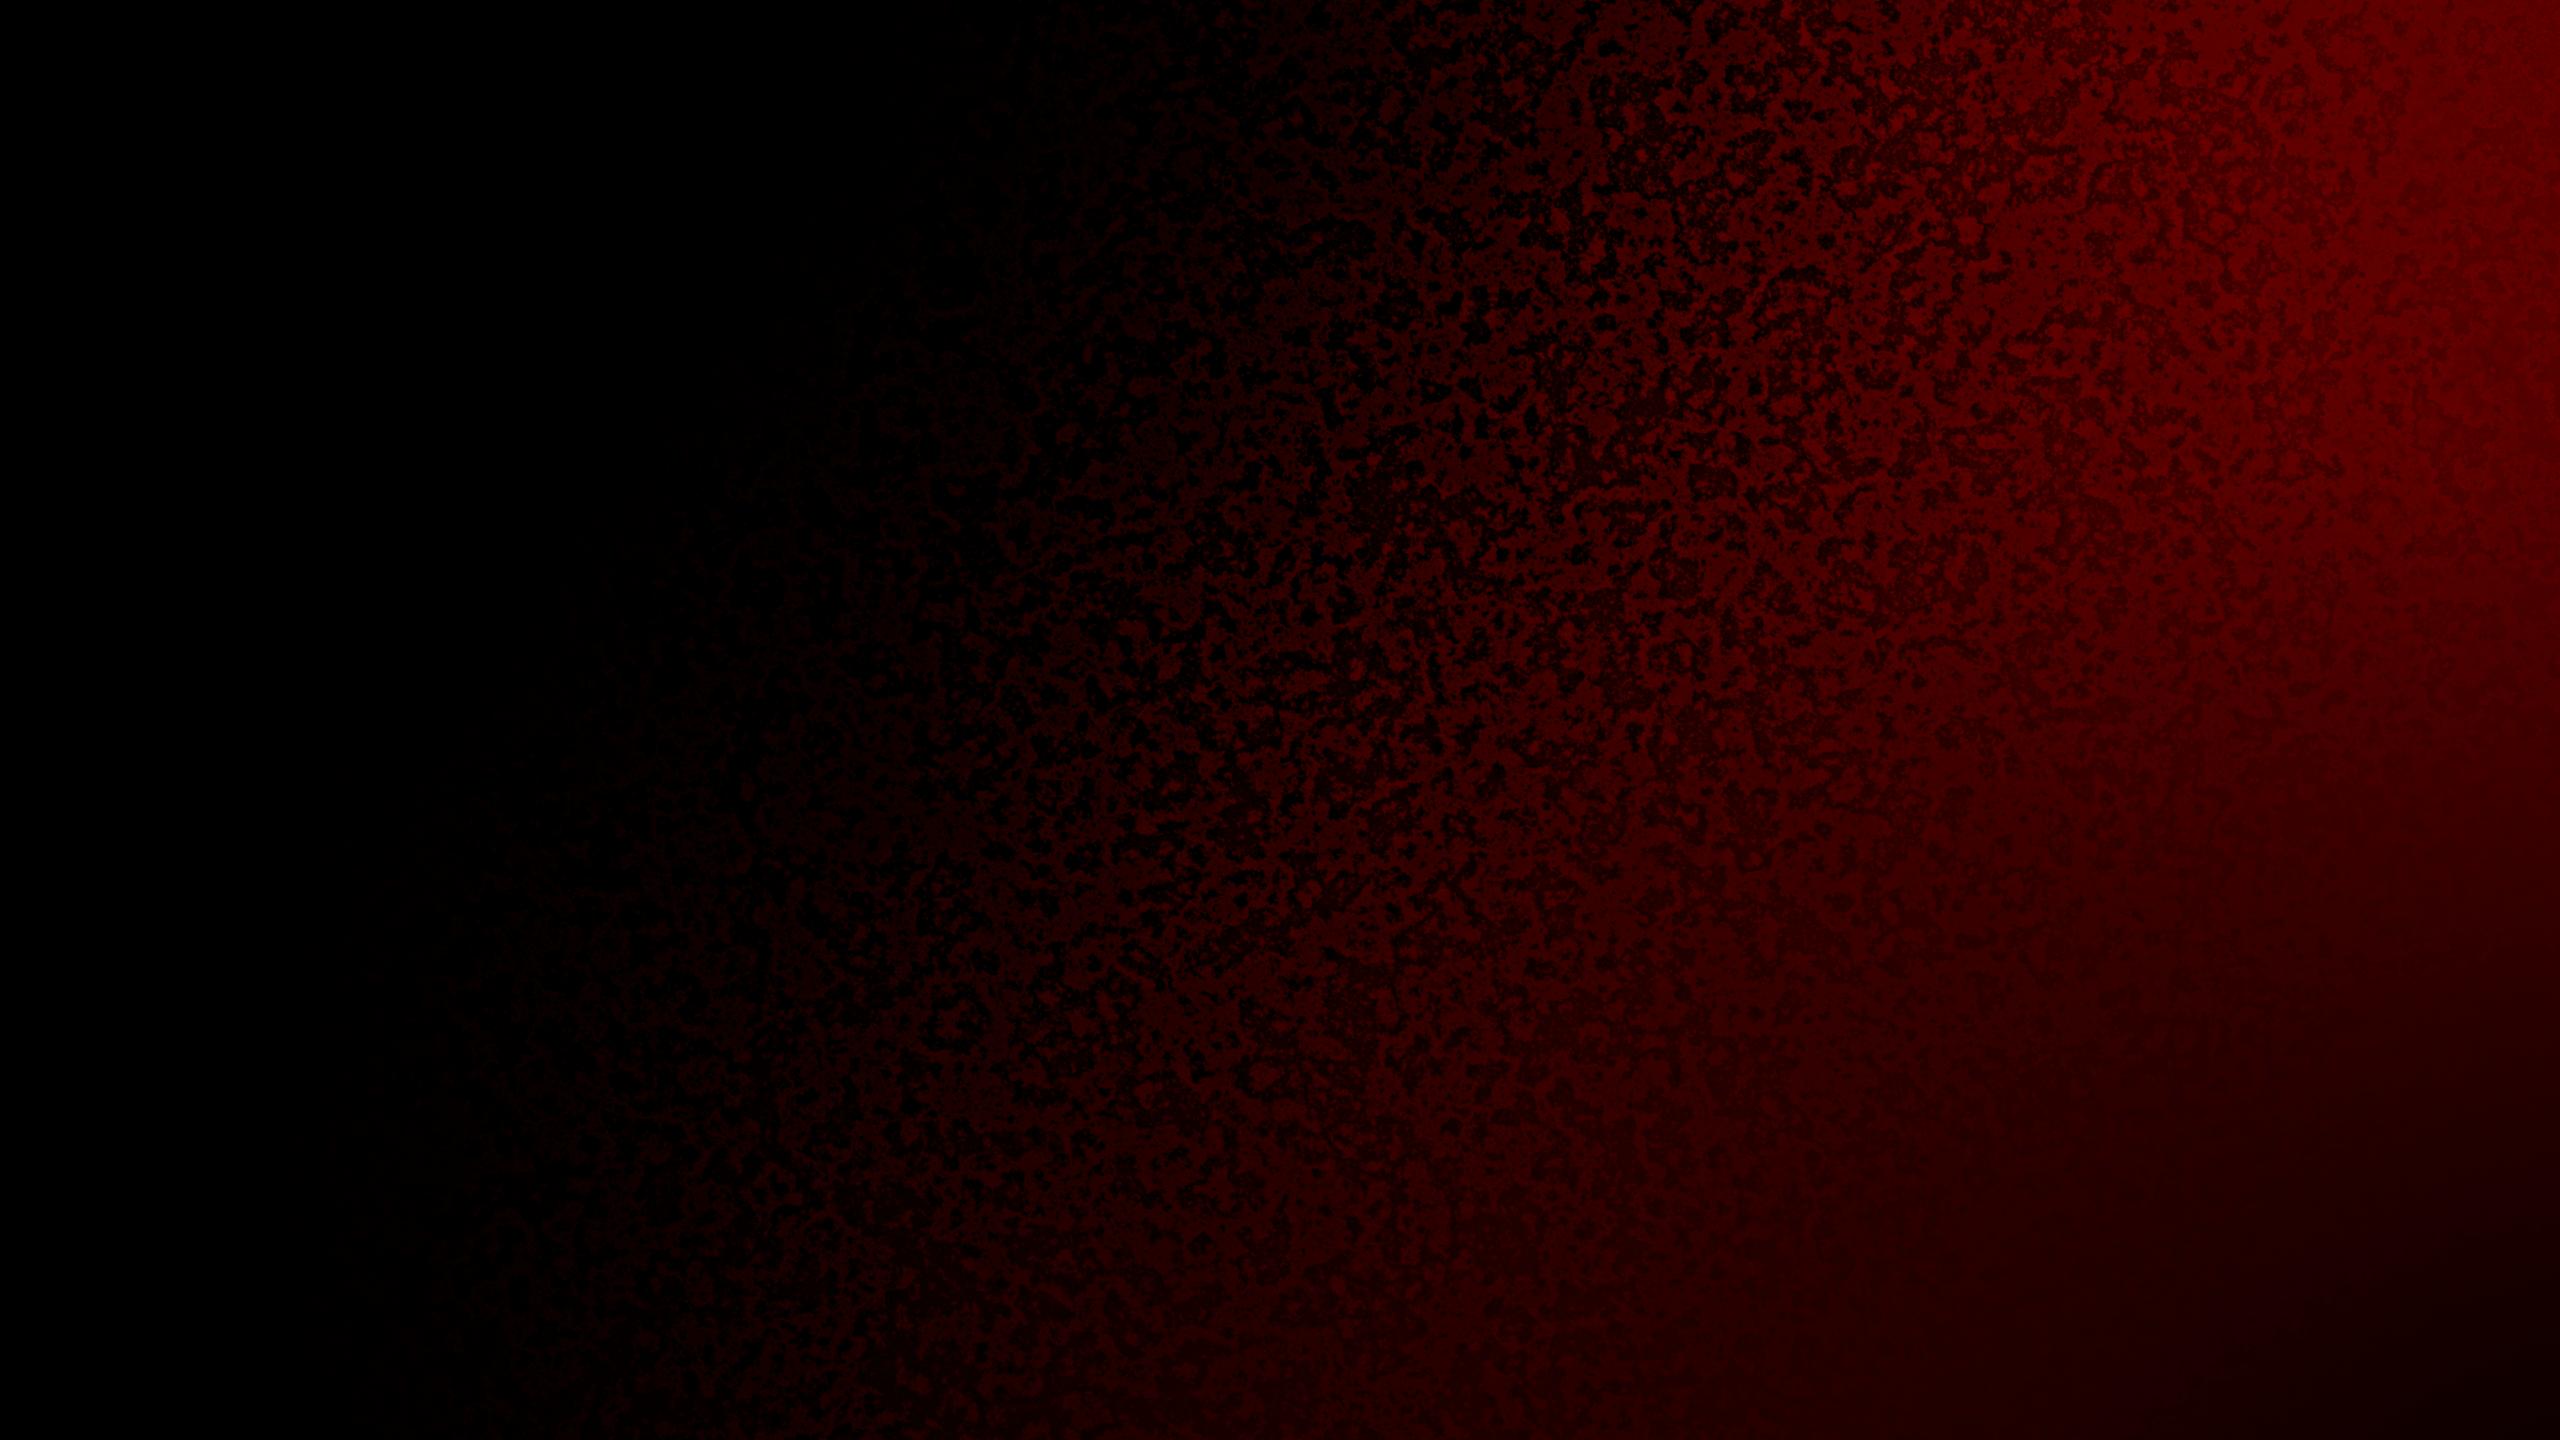 Dark Red Wallpaper Sf Wallpaper